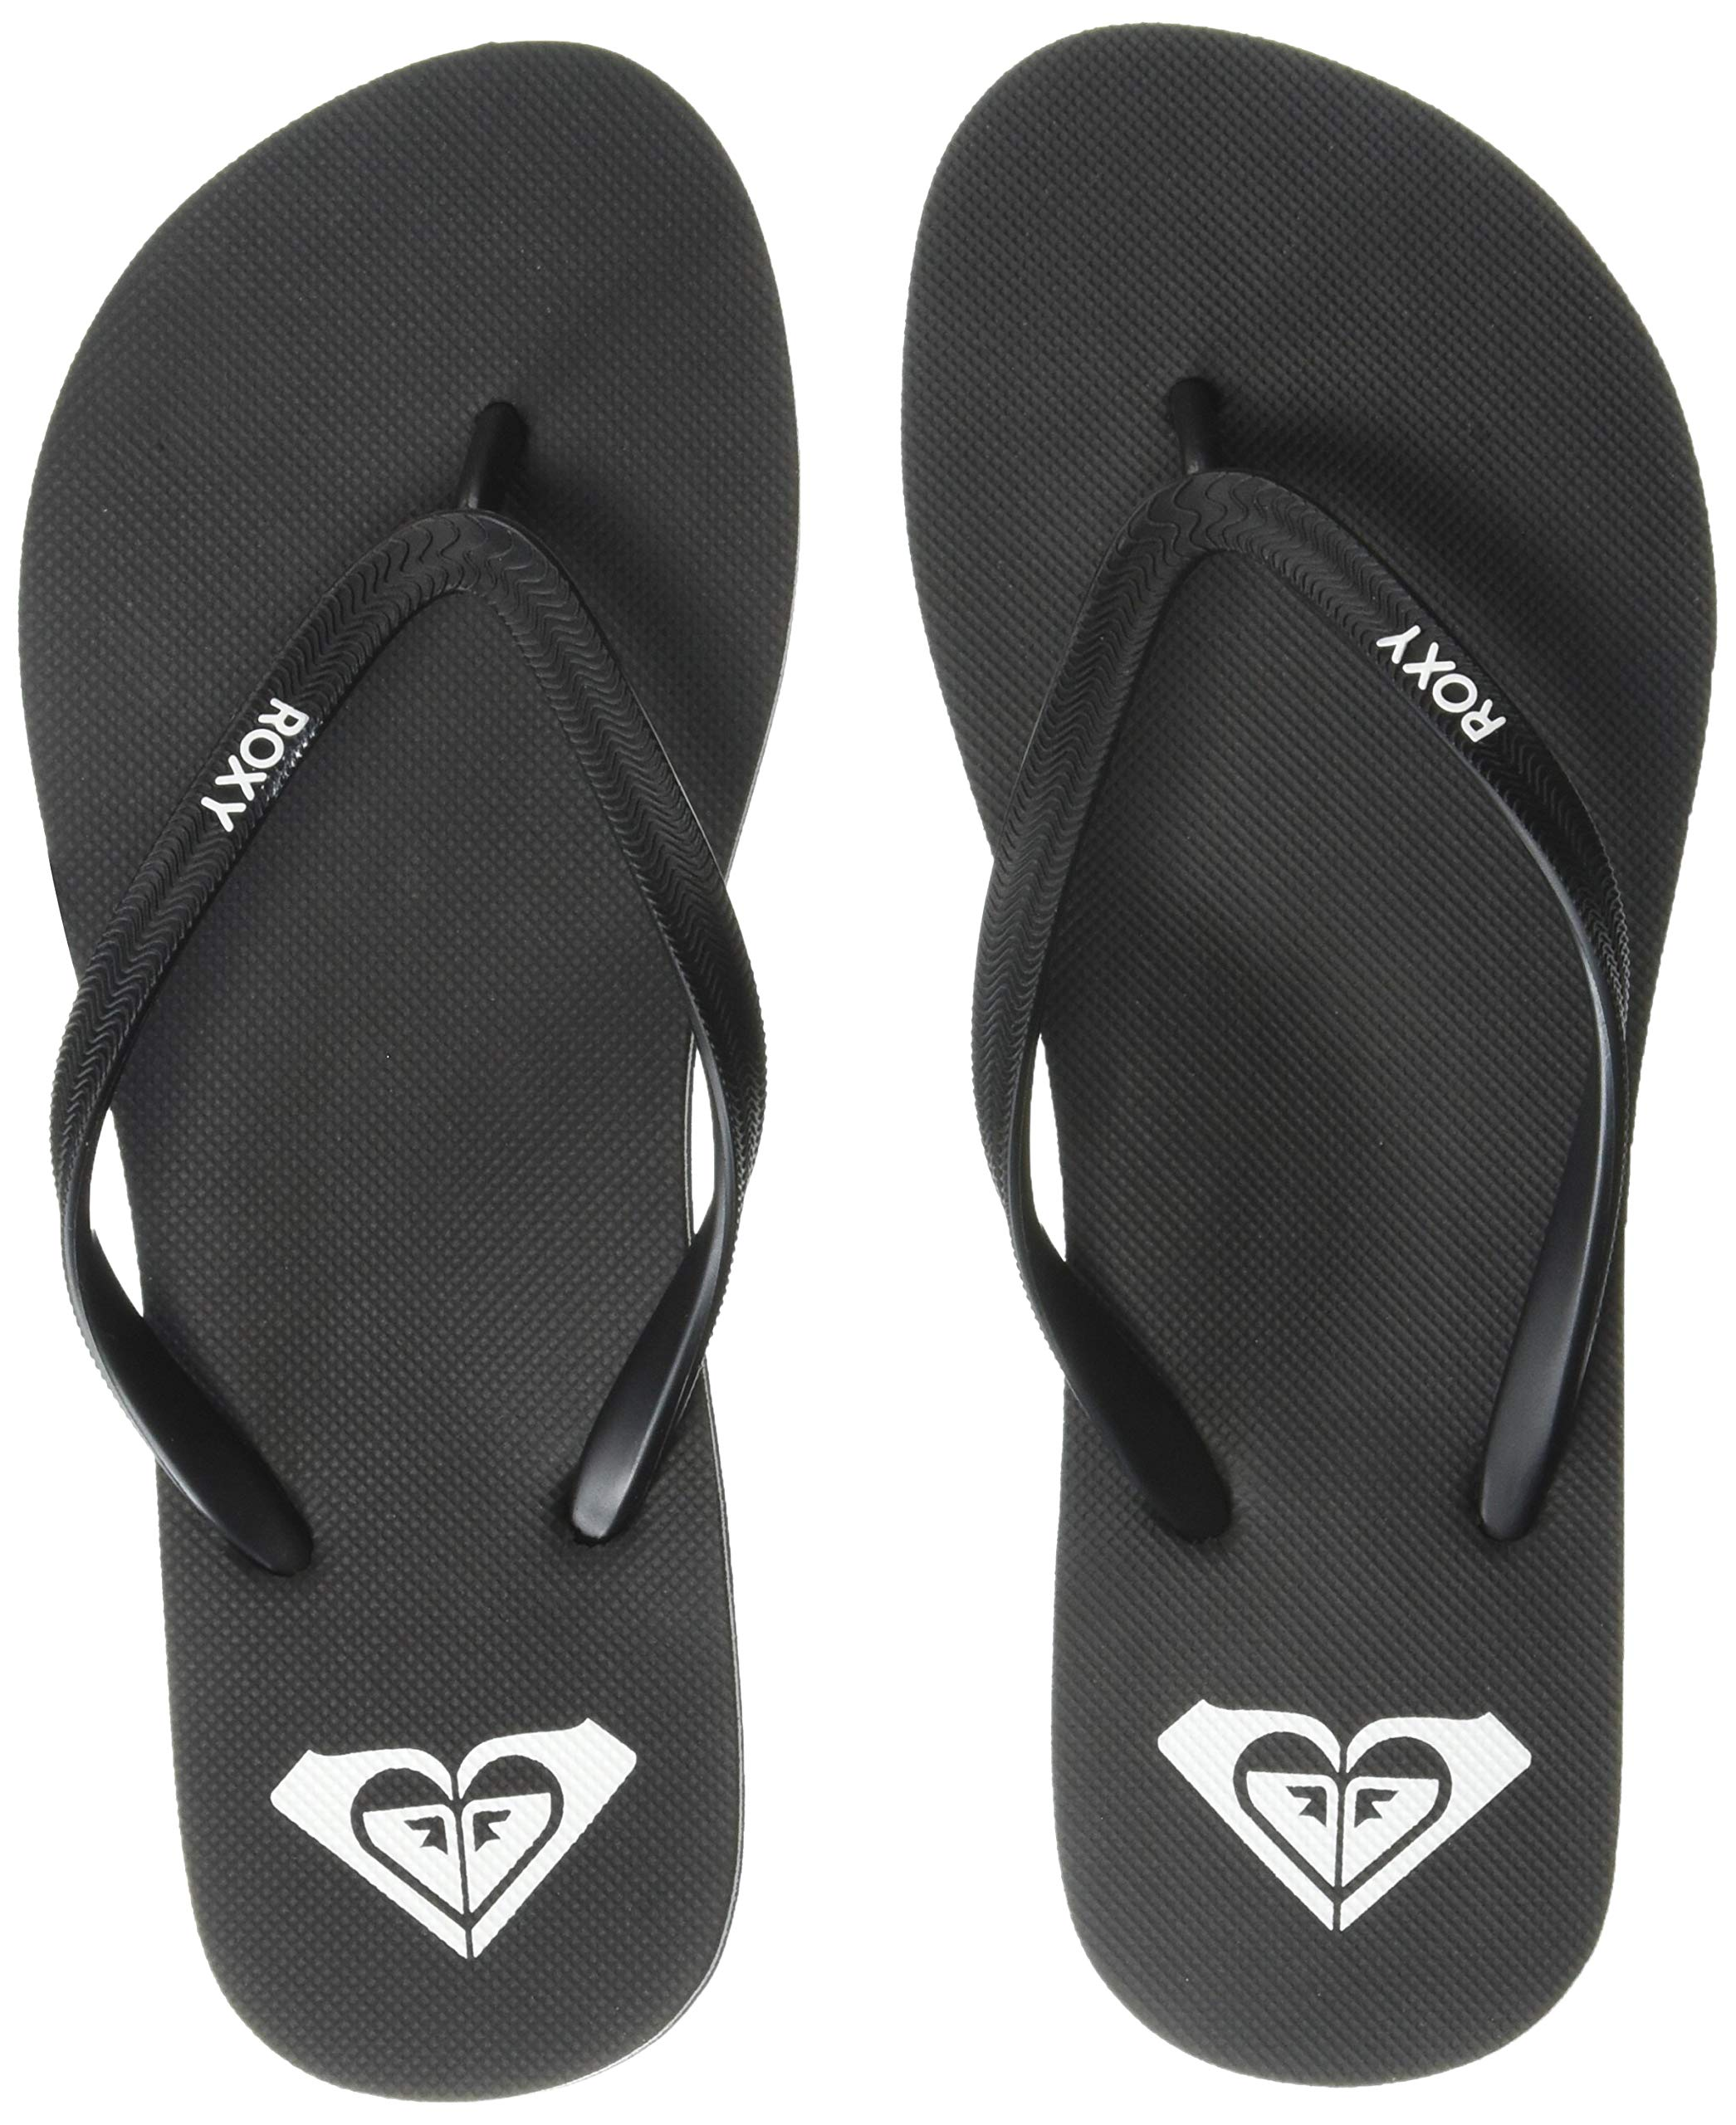 Roxy Womens Sport Sandal Medium